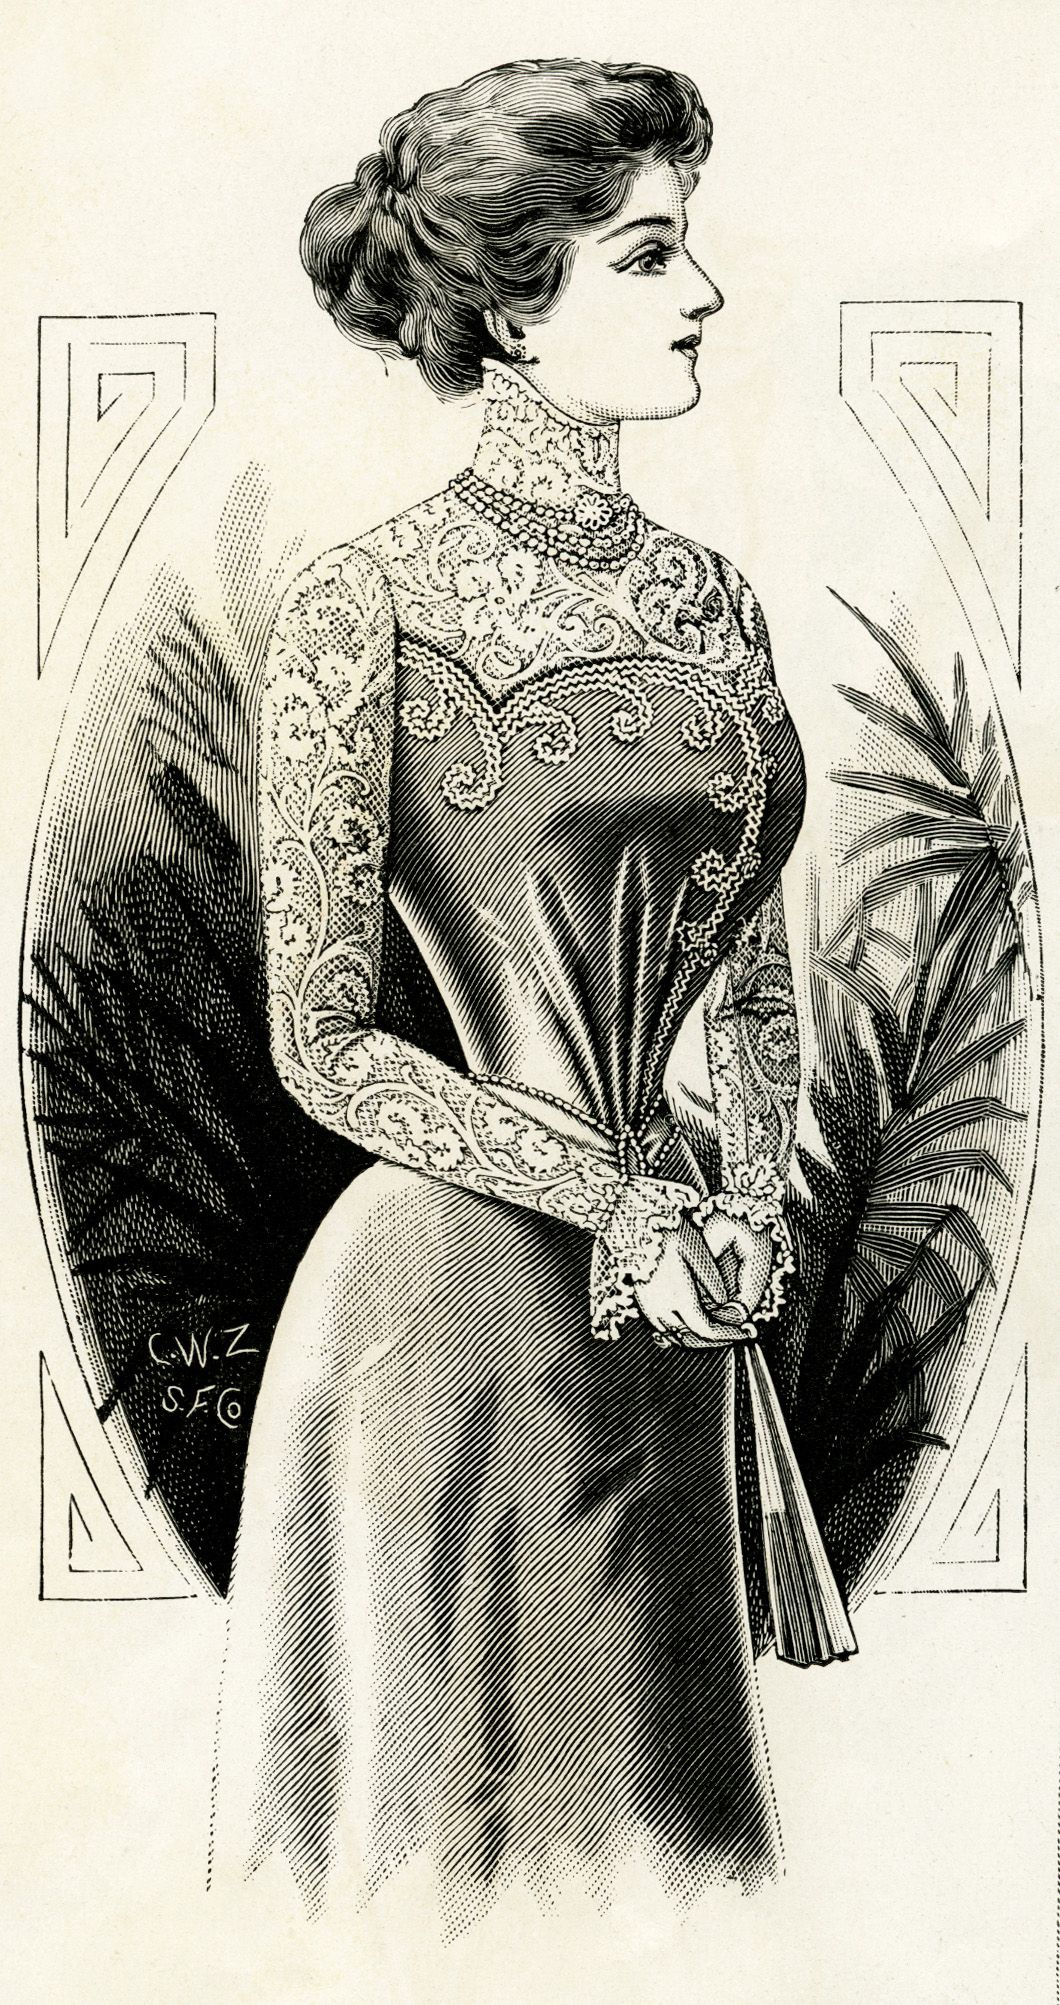 victorian clipart public domain public domain digital image graphic design resource antique designer [ 1060 x 2005 Pixel ]